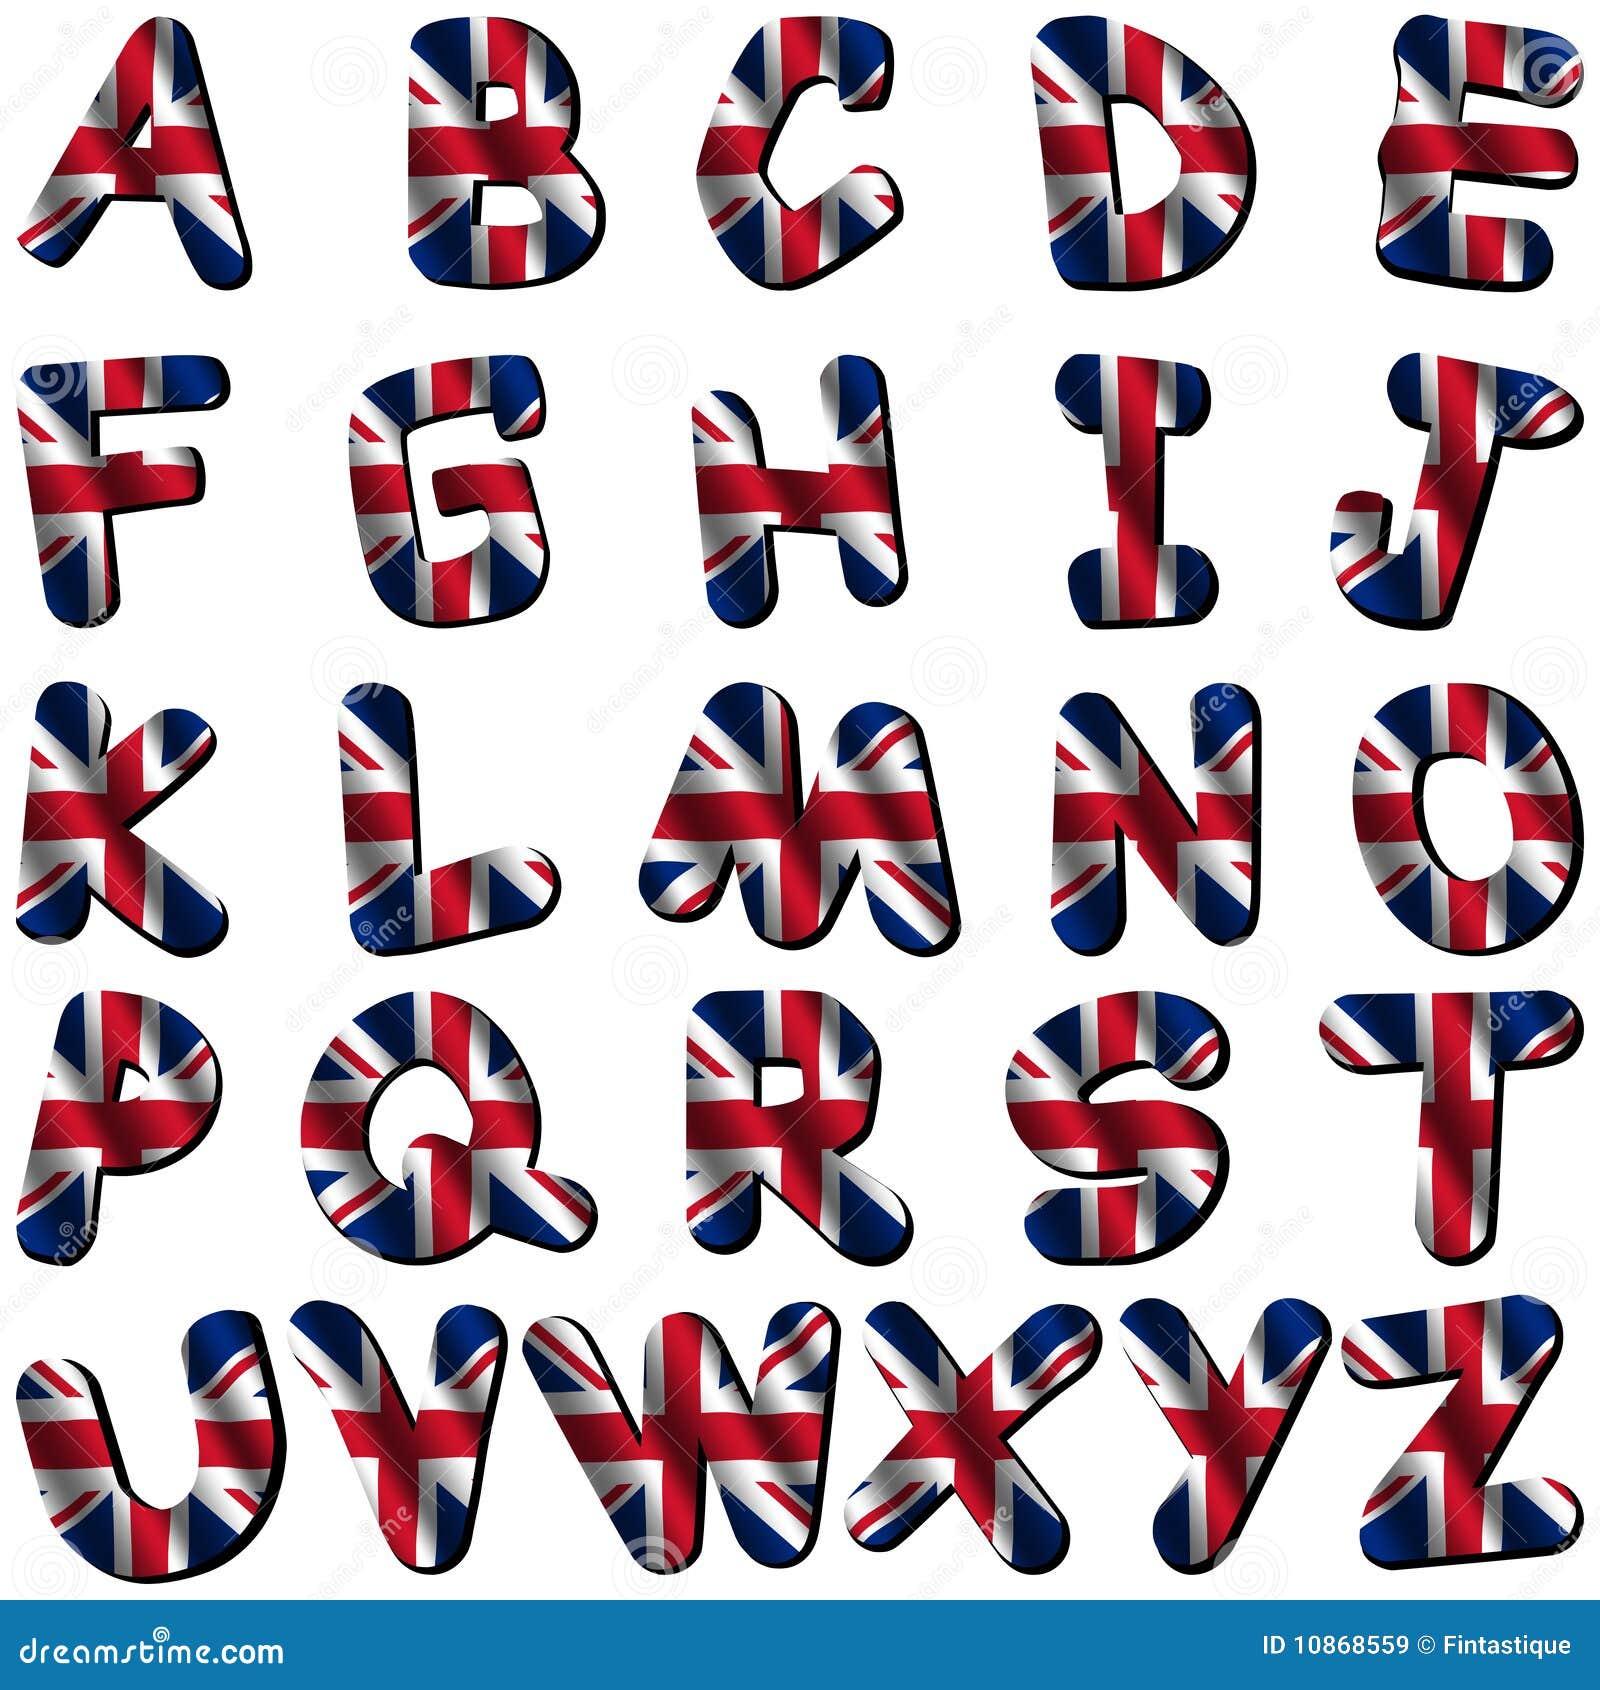 British Flag Font Royalty Free Stock Images - Image: 10868559